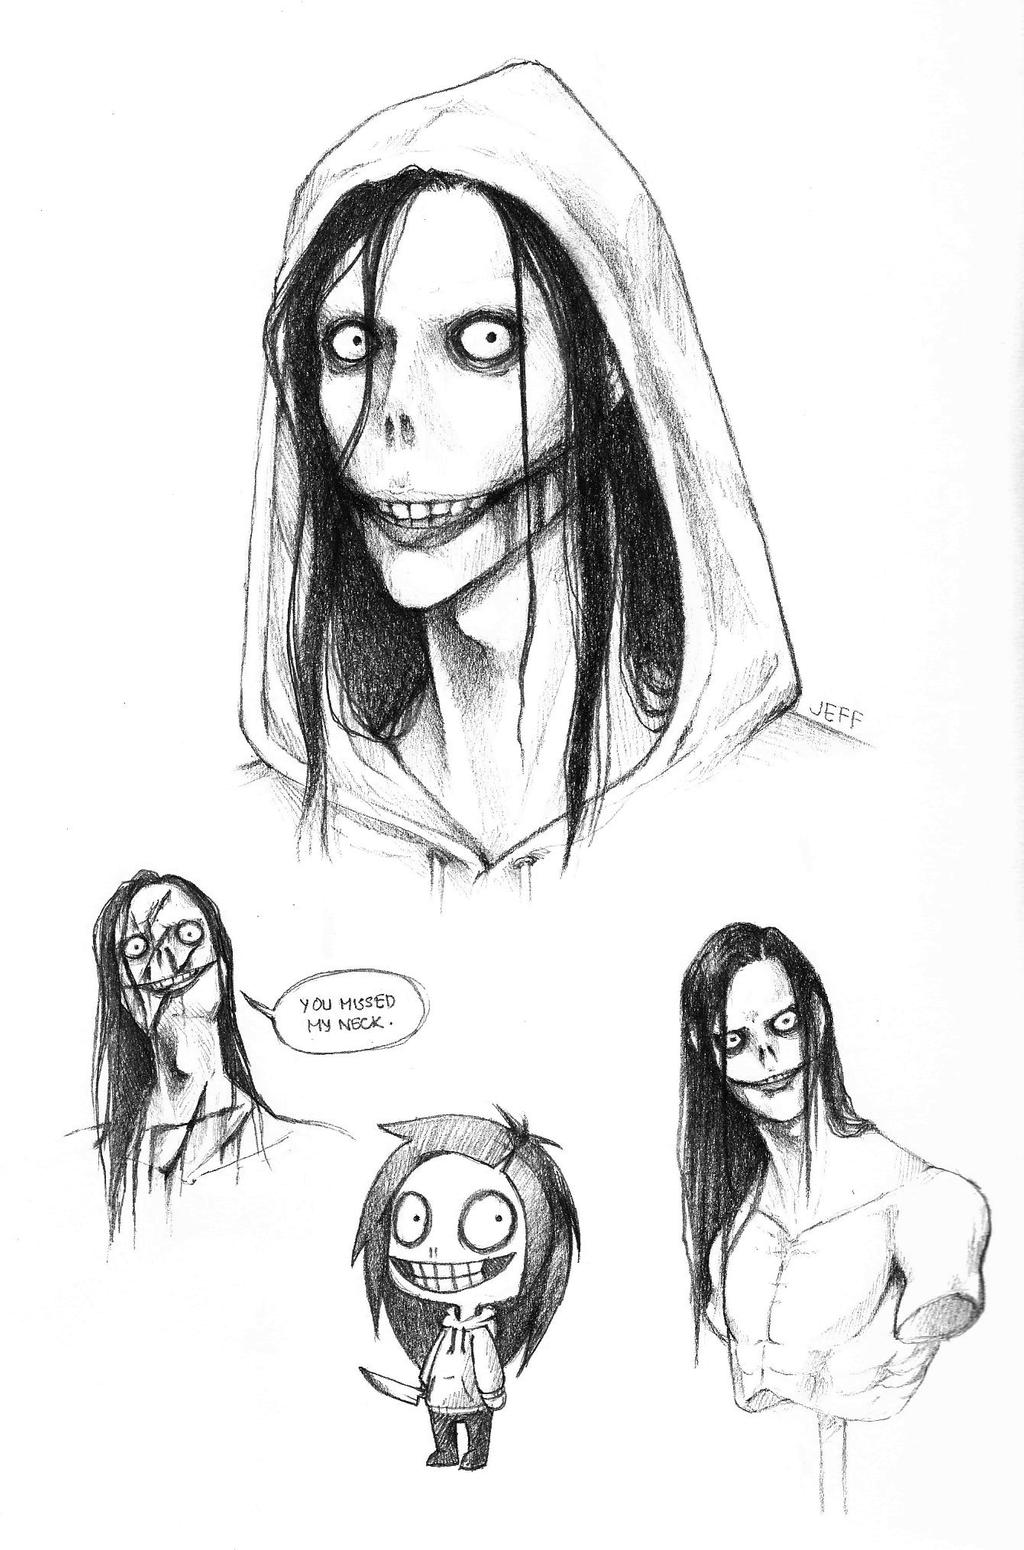 Jeff The Killer Doodles by SUCHanARTIST13